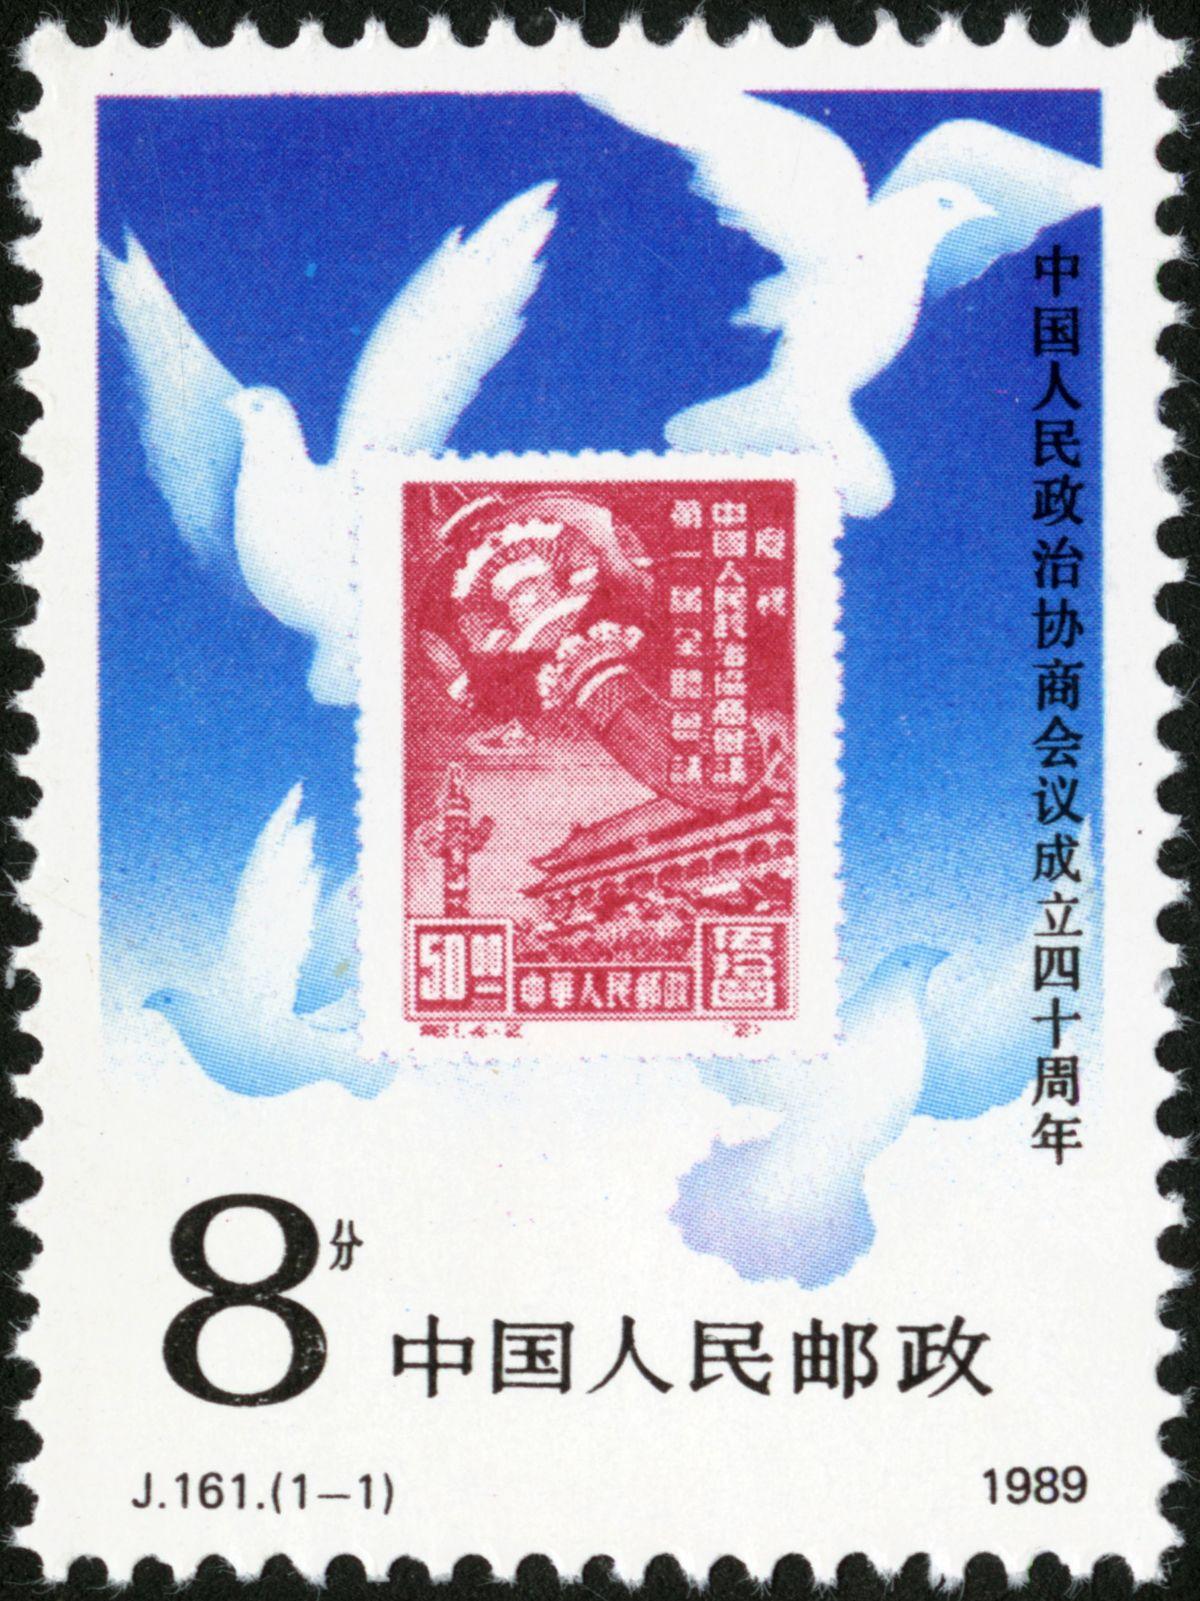 J161 中国人民政治协商会议成立四十周年 大版